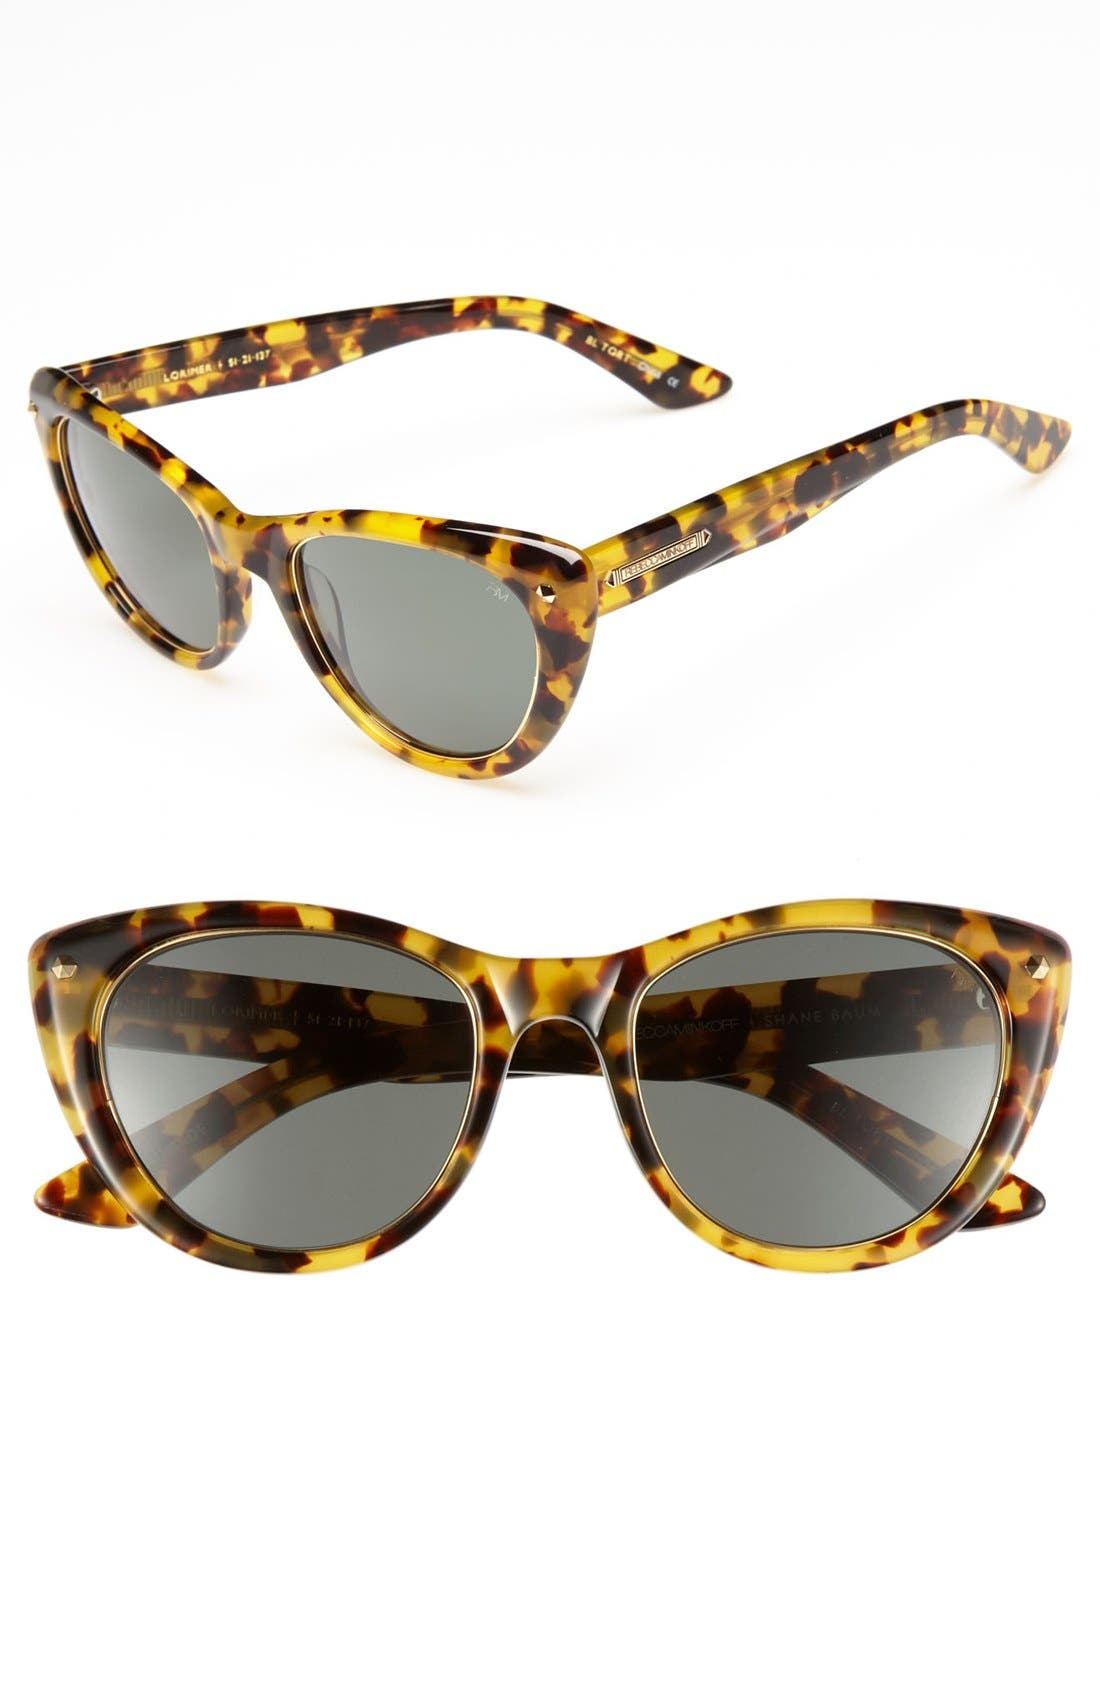 Main Image - Rebecca Minkoff 'Lorimer' Sunglasses